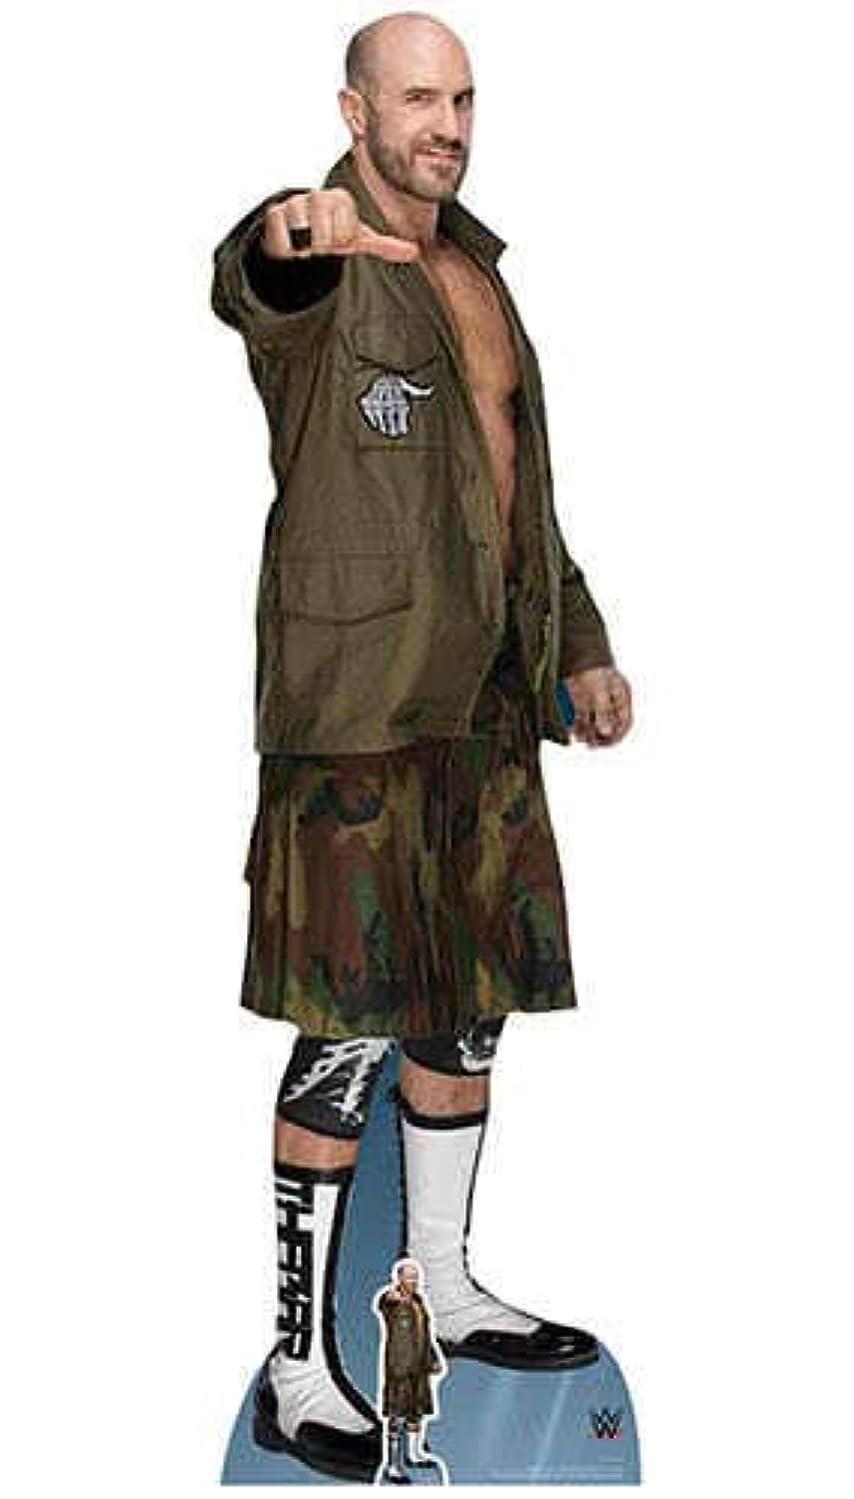 Star Cutouts SC1209 Official Lifesize Cardboard WWE Figure Cesaro 195cm Tall, Multicolour vflmuxasfqqvdm